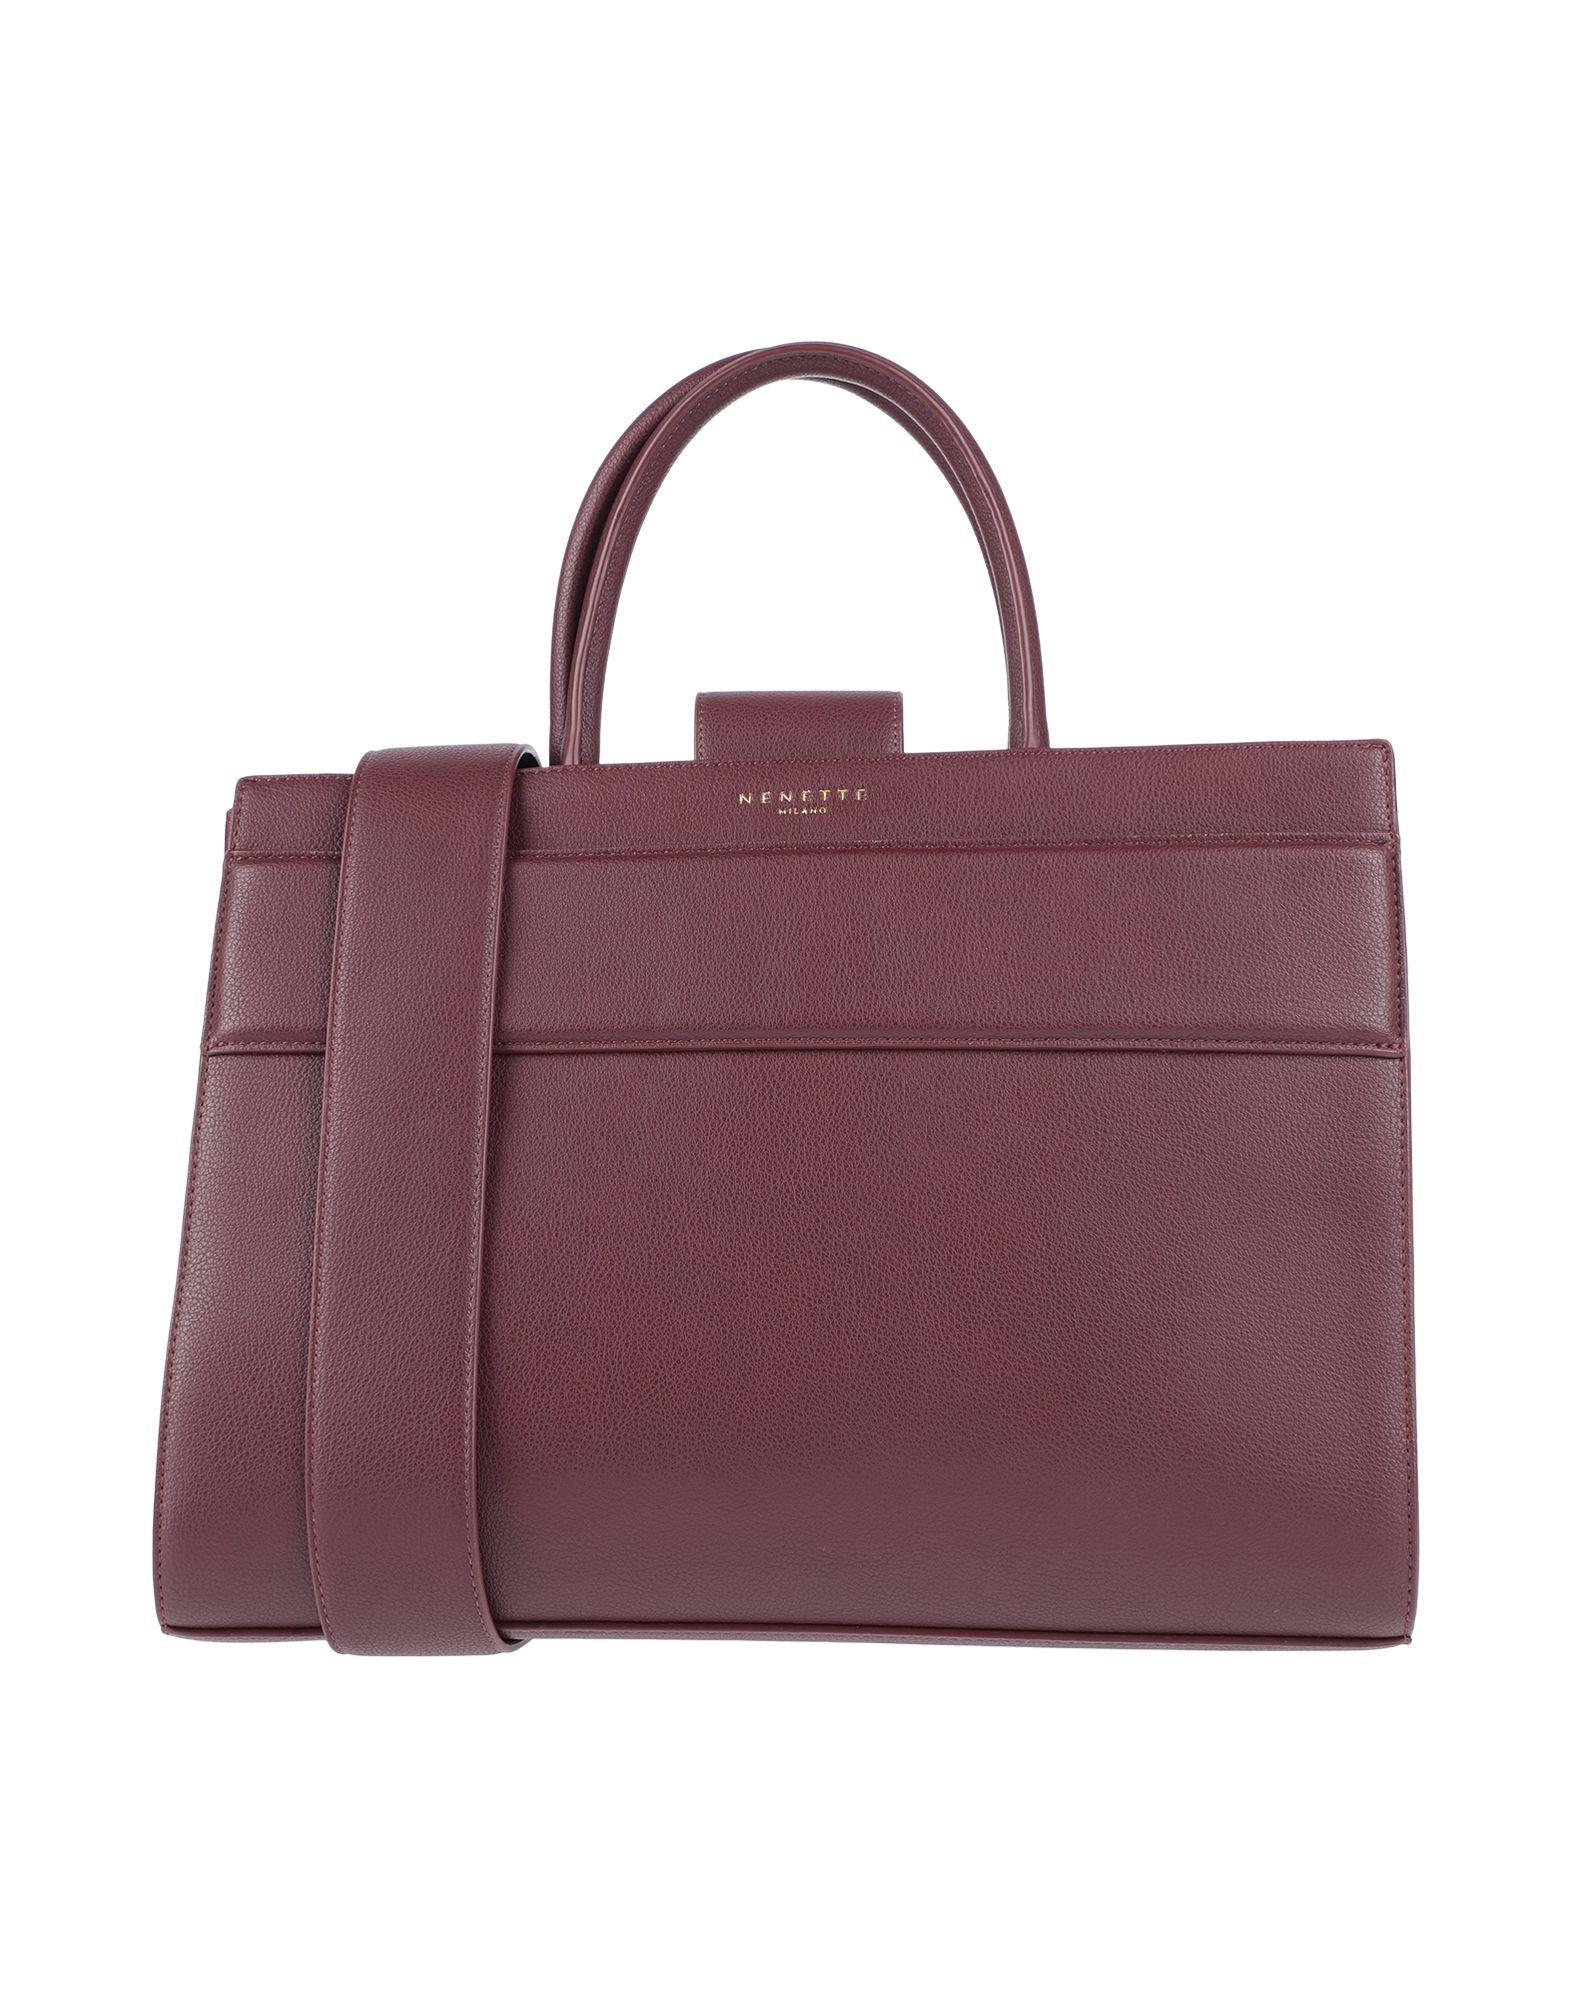 Nenette Maroon Faux Leather Top Handle Bag